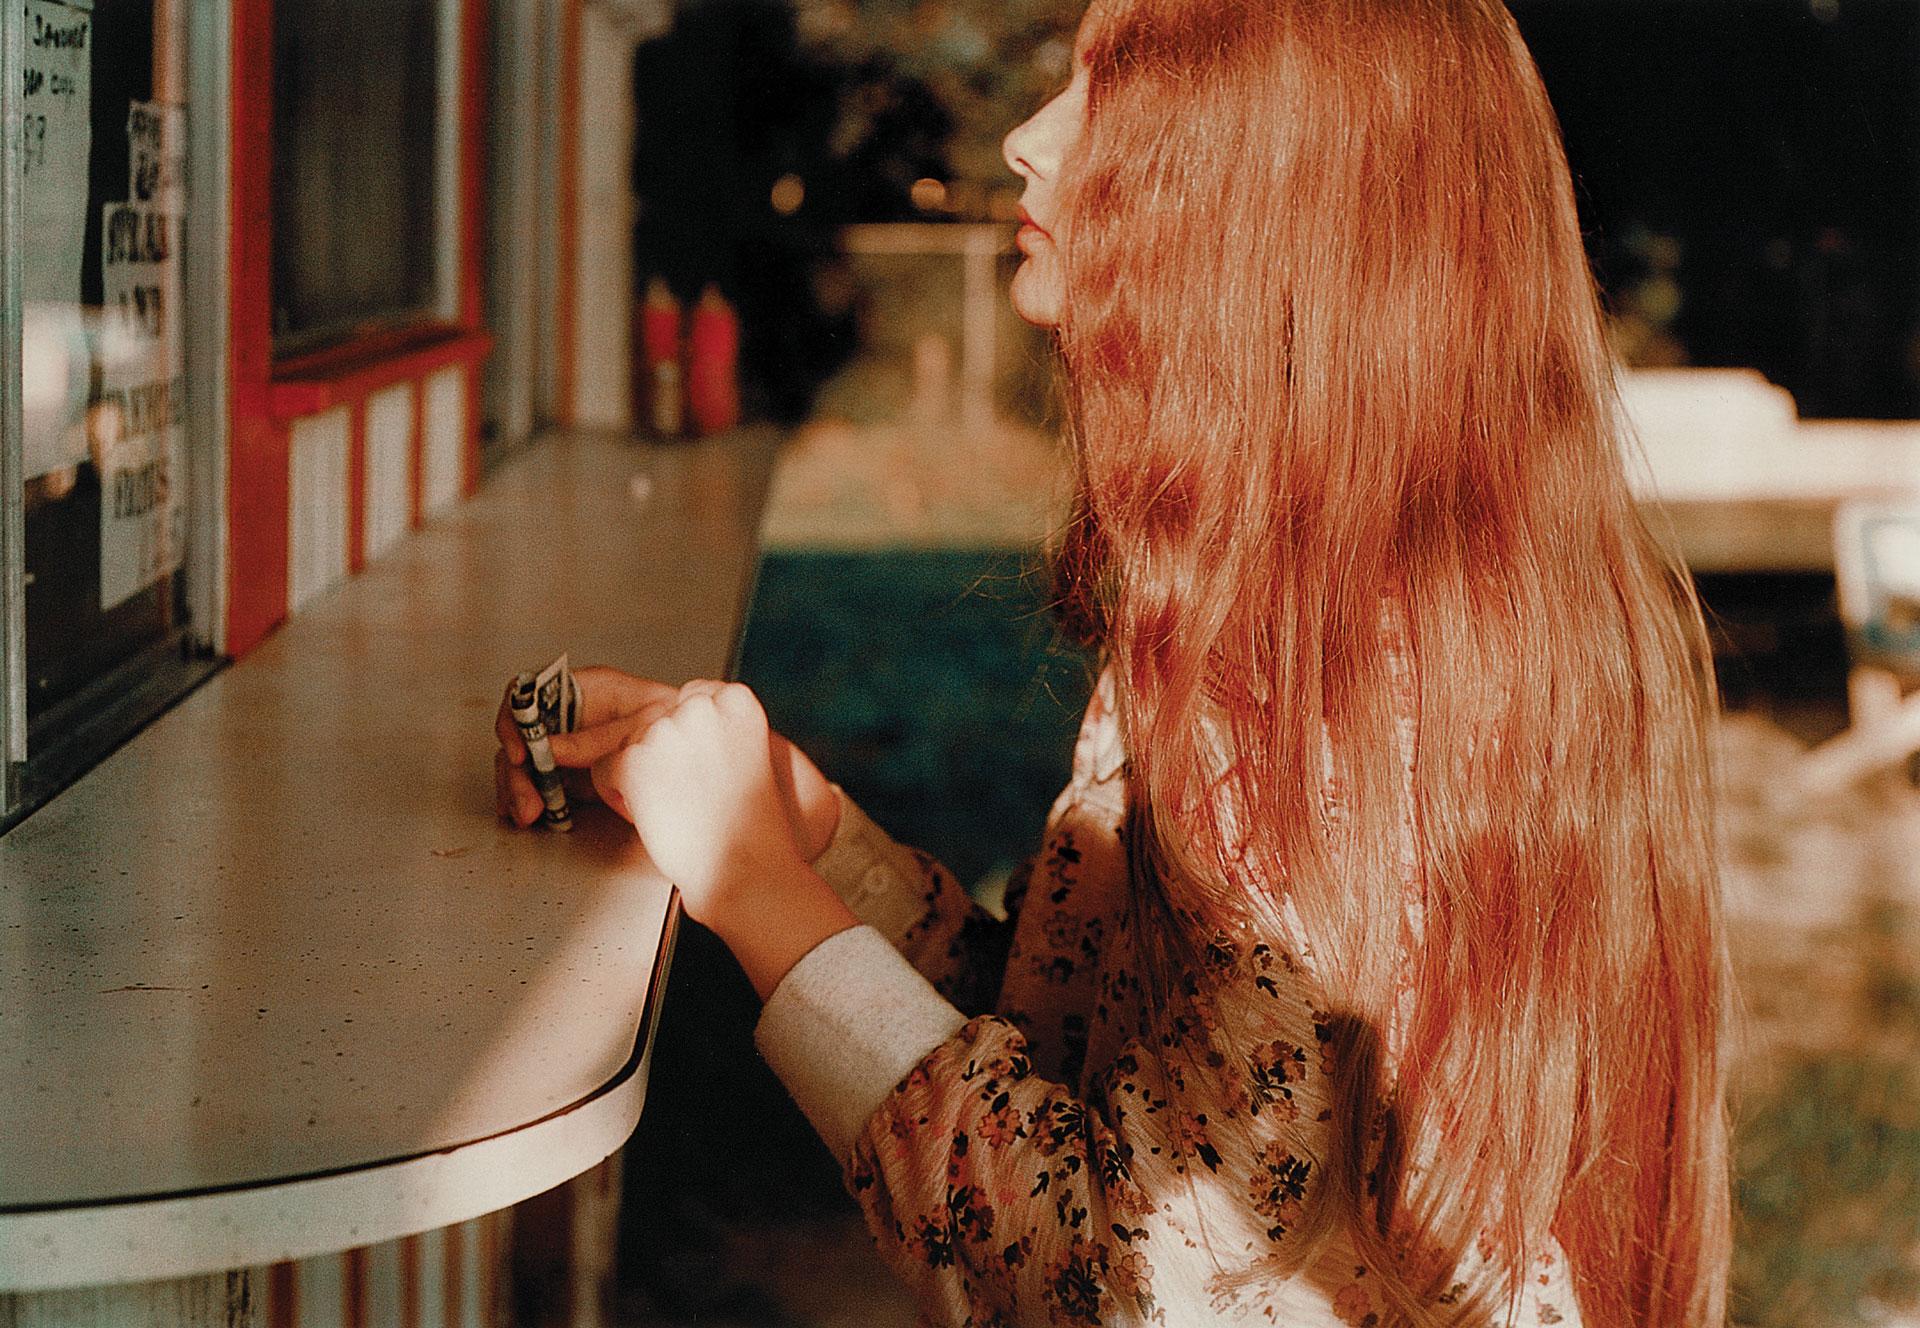 Untitled, 1970–4 (Dennis Hopper), William Eggleston portraits